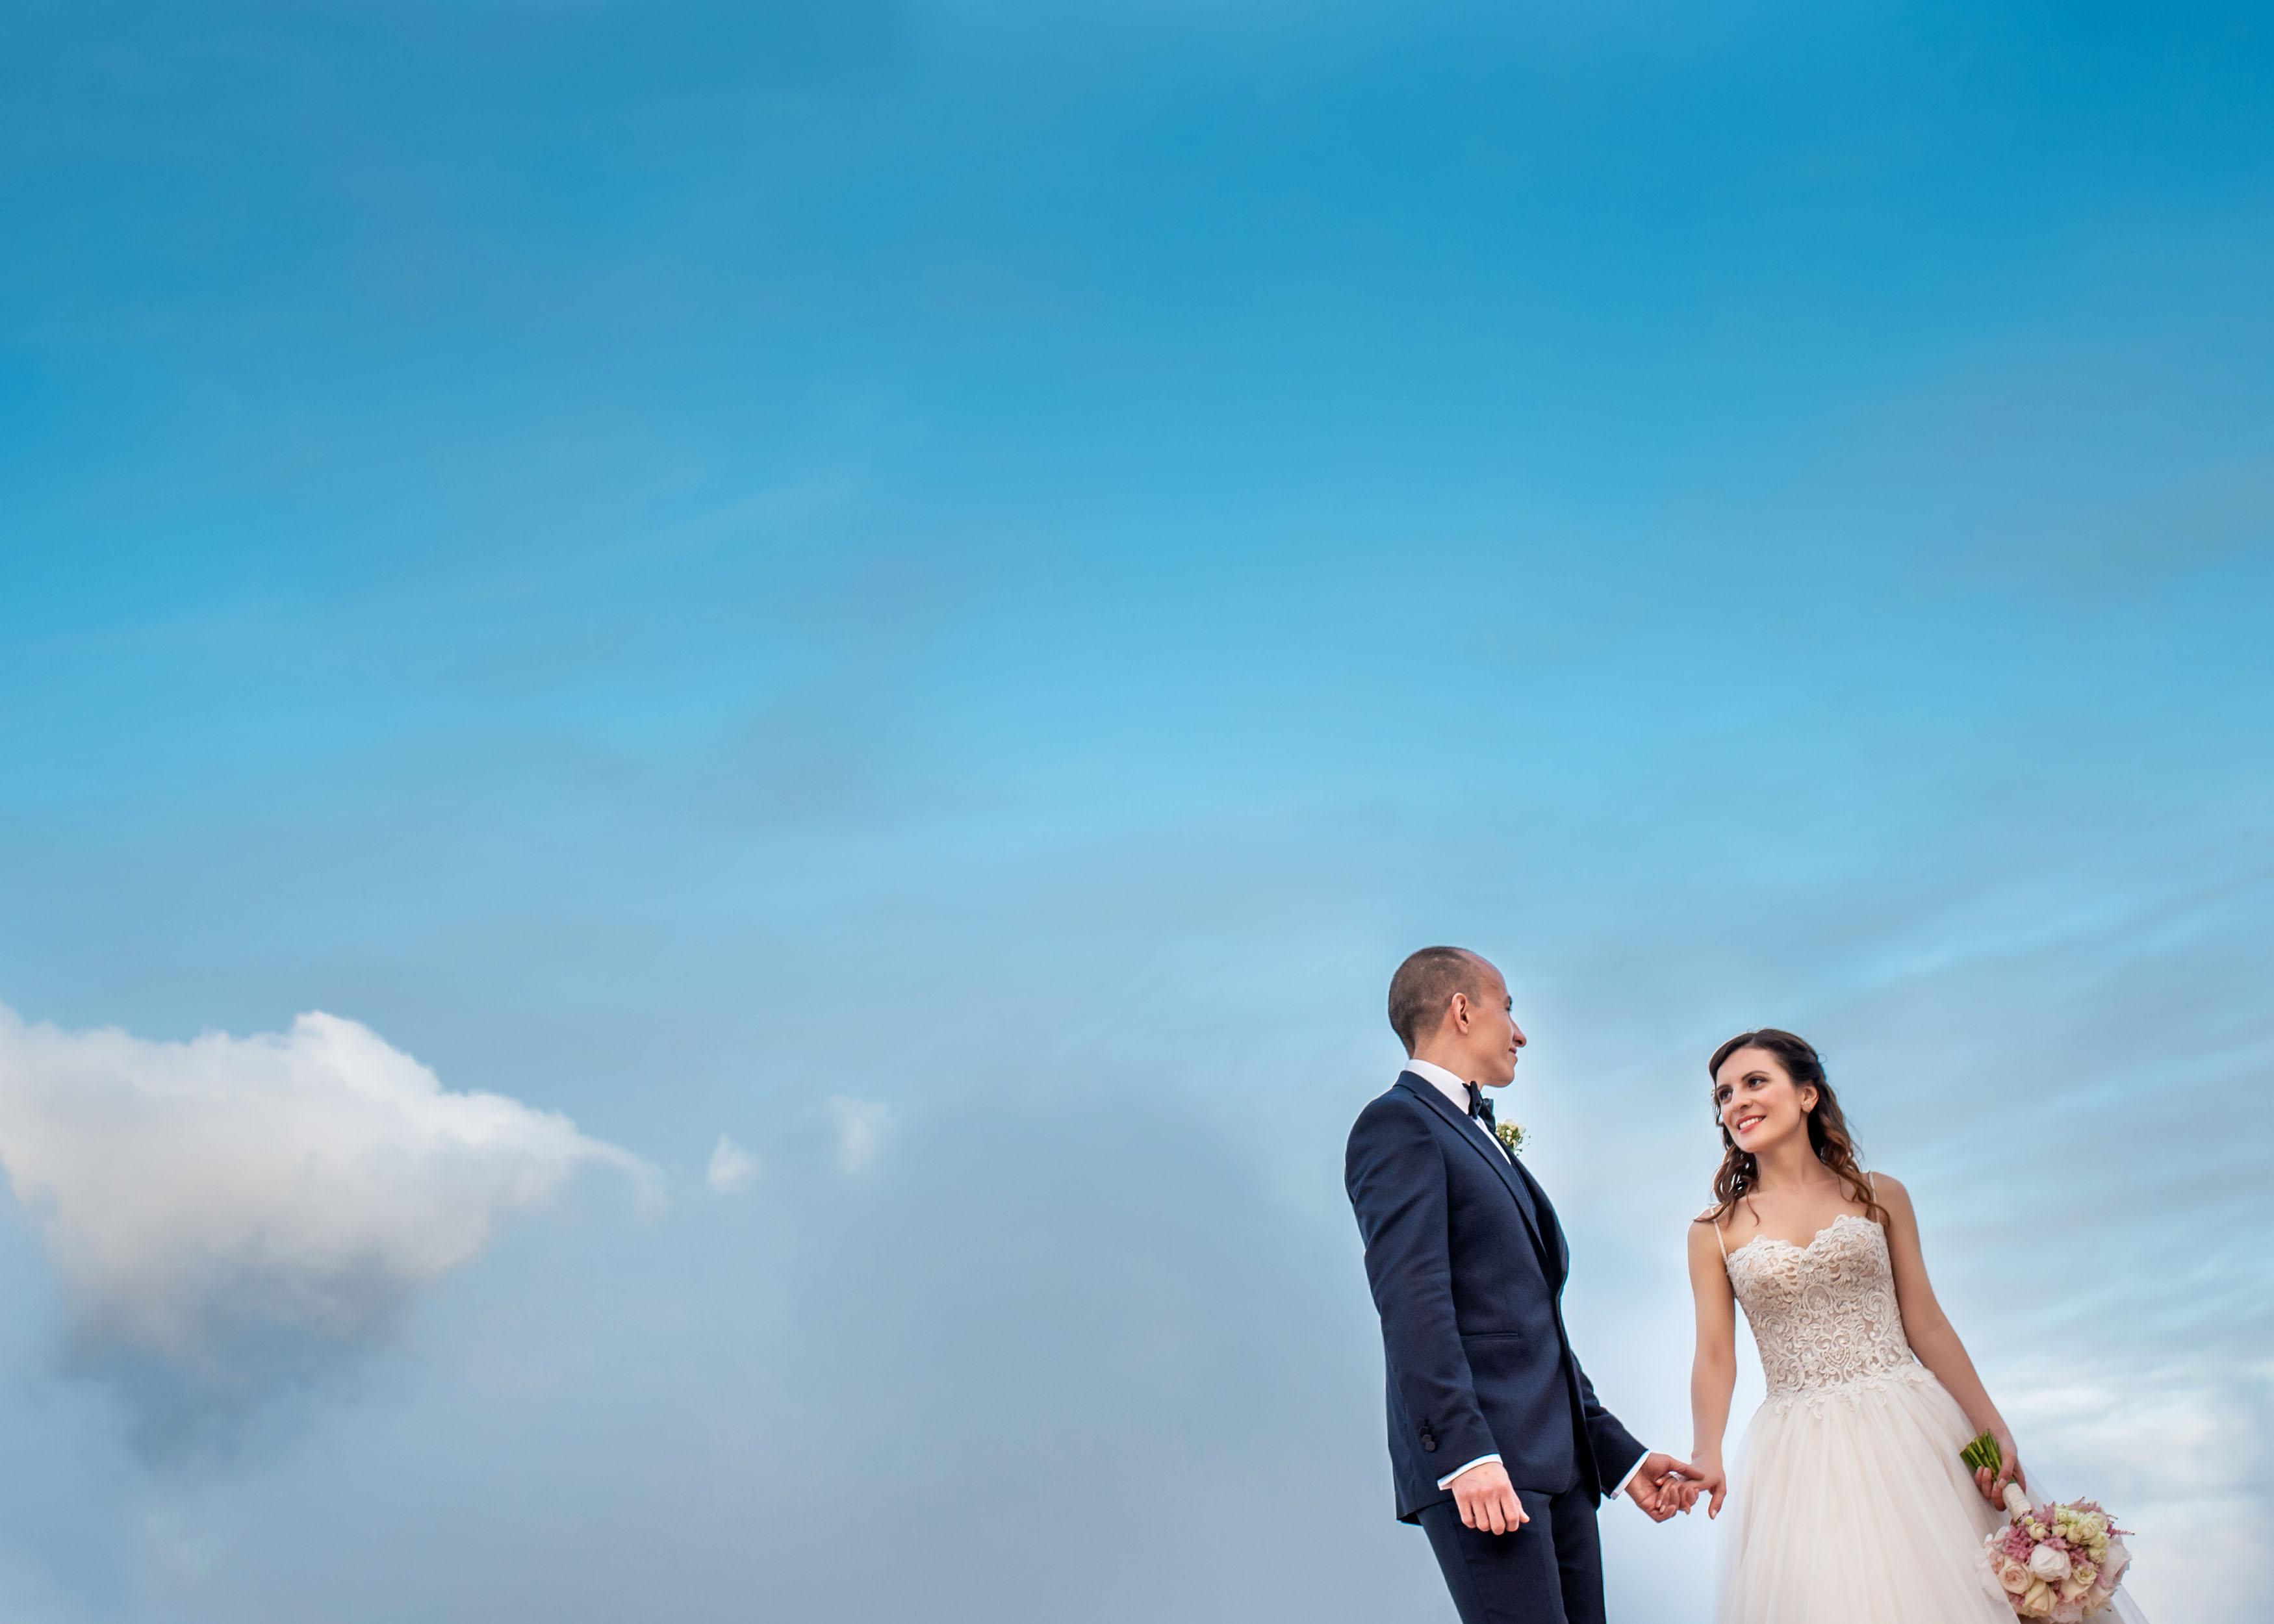 https://www.weddingamalfi.com/wp-content/uploads/Katia-Jorge-18-maggio-2019-35.jpg